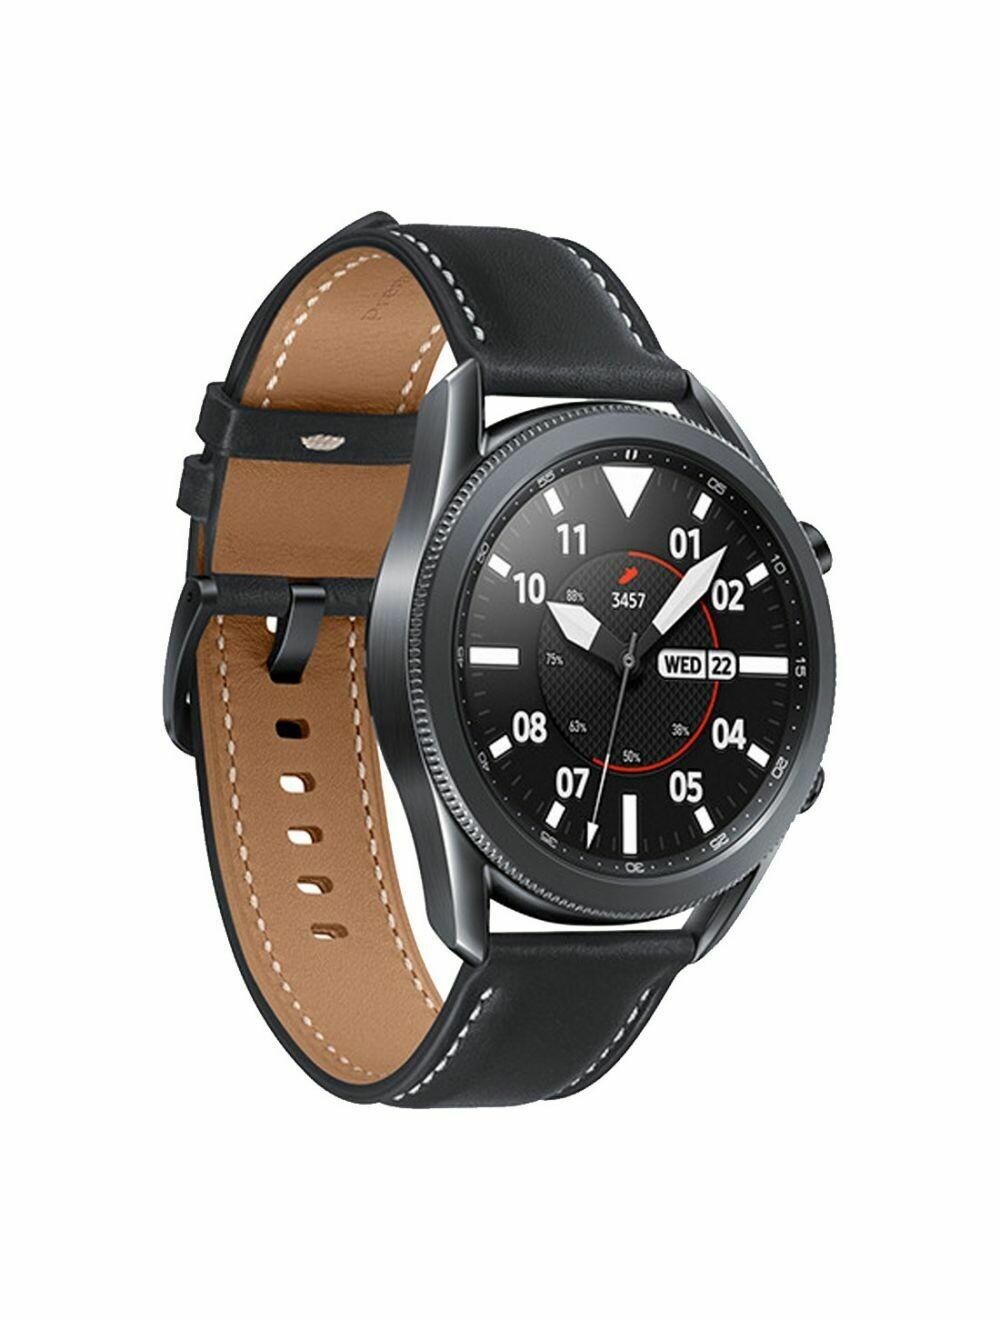 Samsung Galaxy Watch 3 (45mm, GPS, Bluetooth) Smart Watch